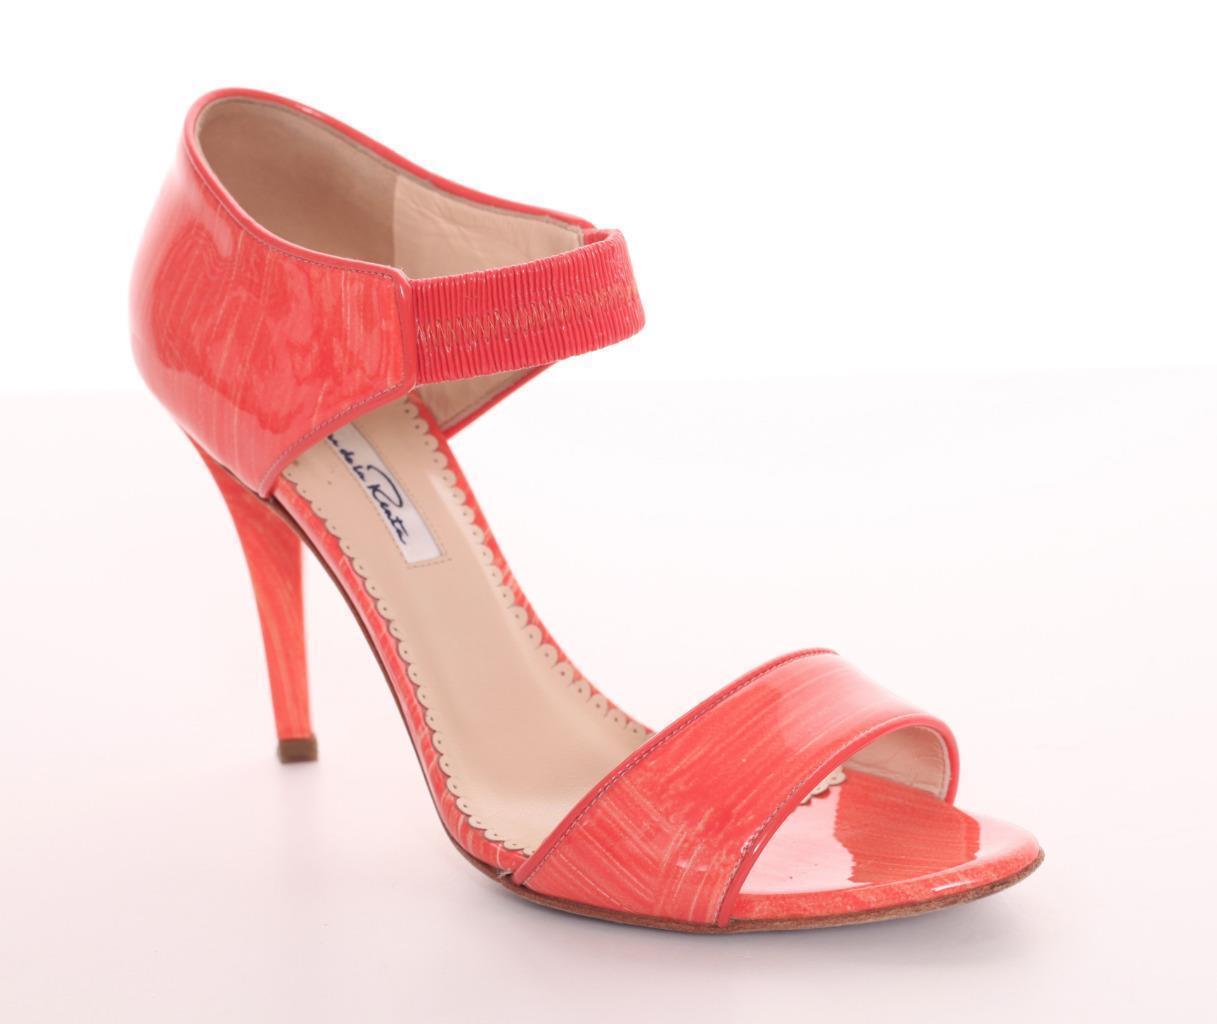 OSCAR DE LA RENTA Coral Patent Leather Open-Toe Sandal 7.5-37.5 Pump 7.5-37.5 Sandal $795 b526ba